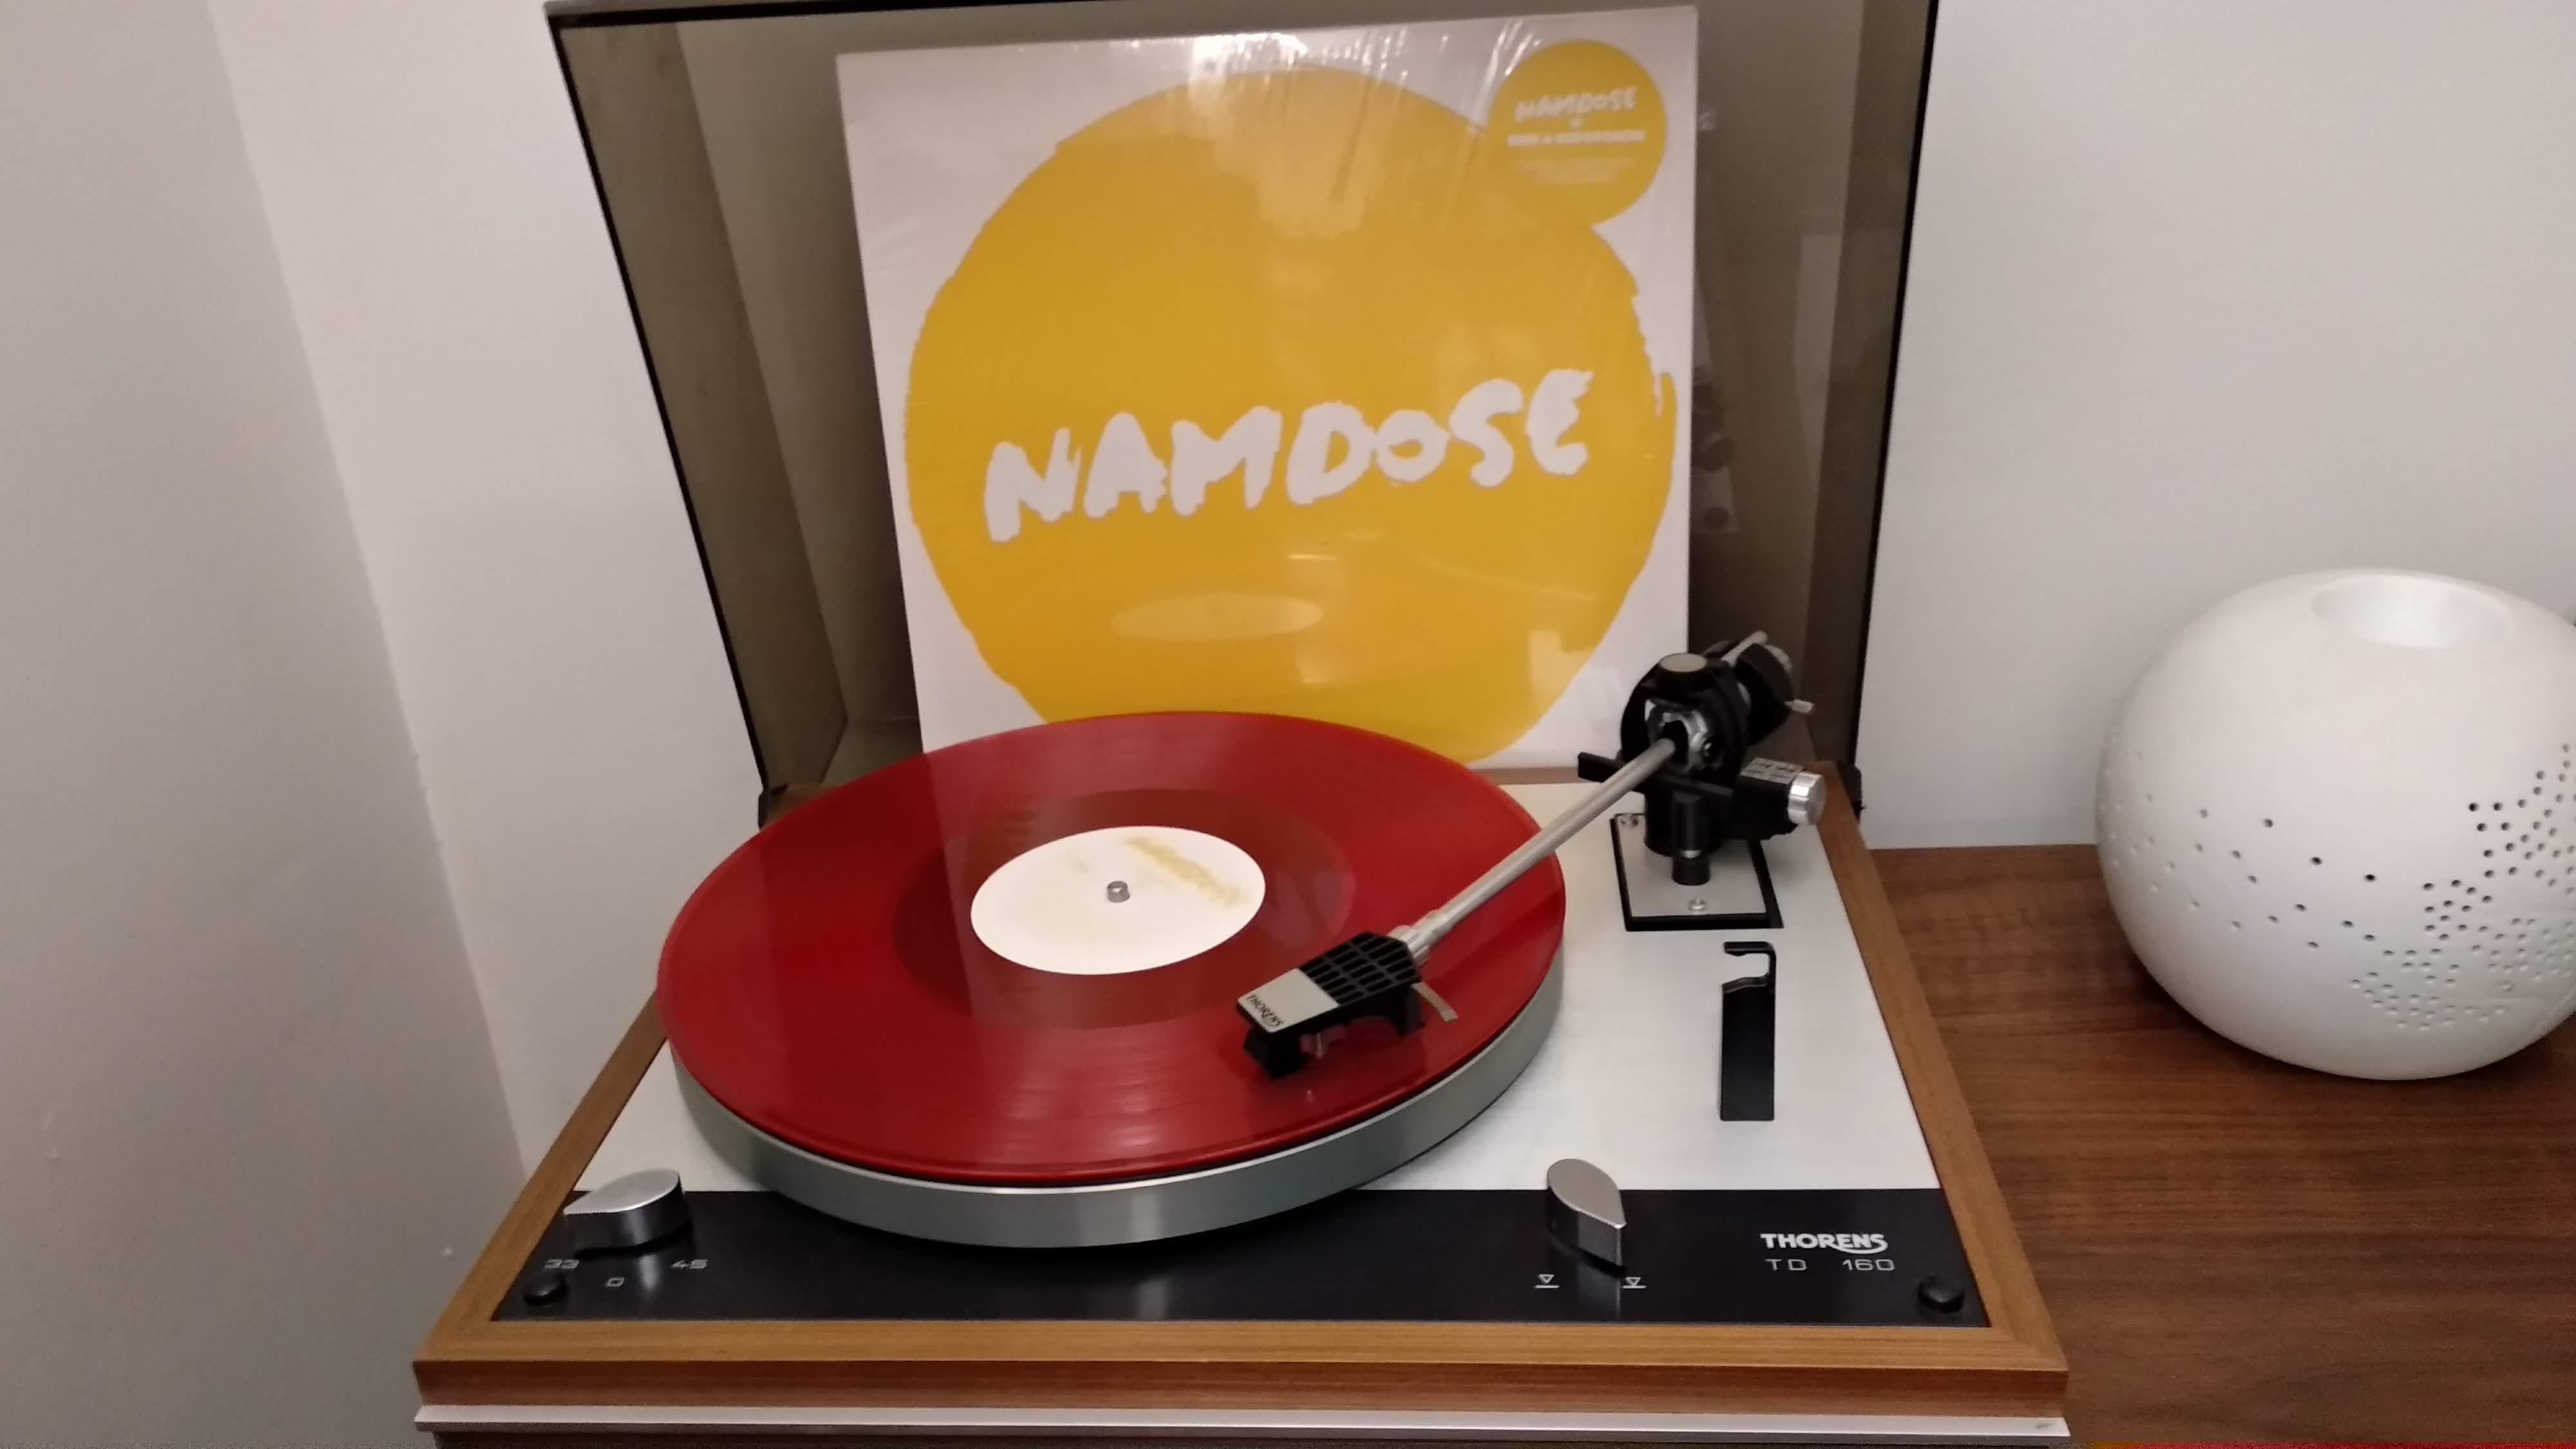 Namdose vinyle LP